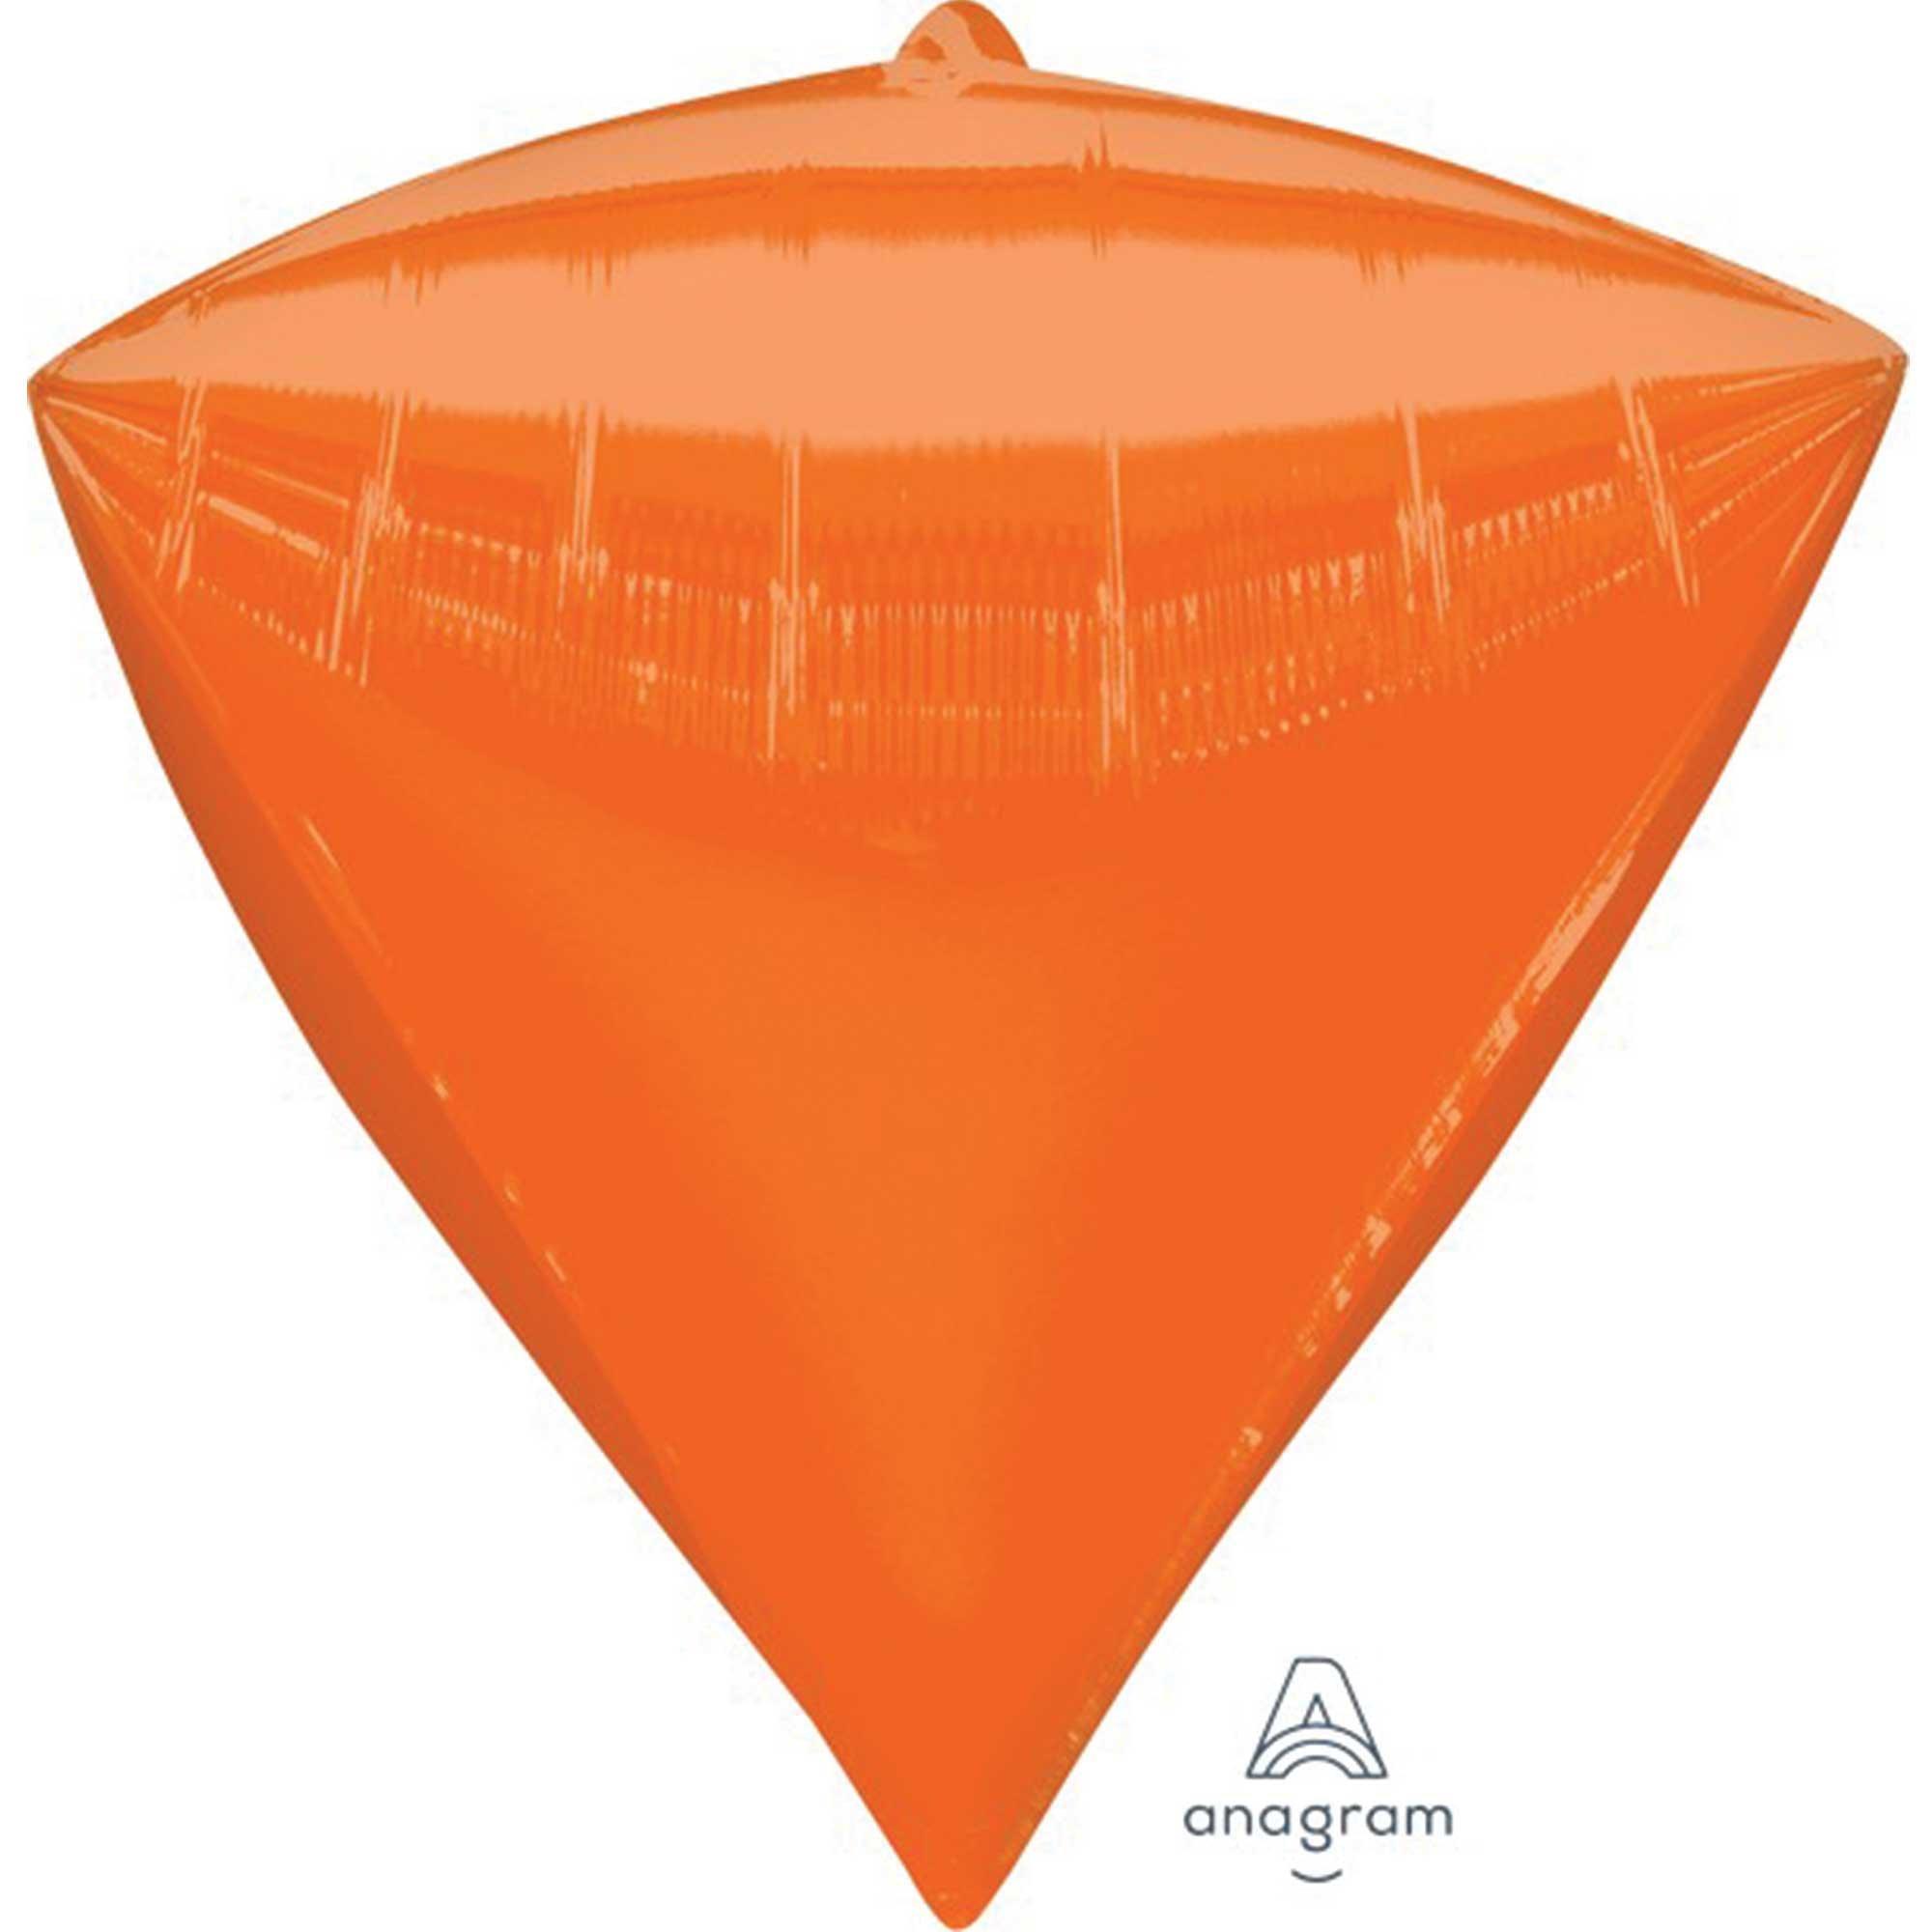 UltraShape Diamondz Orange G20